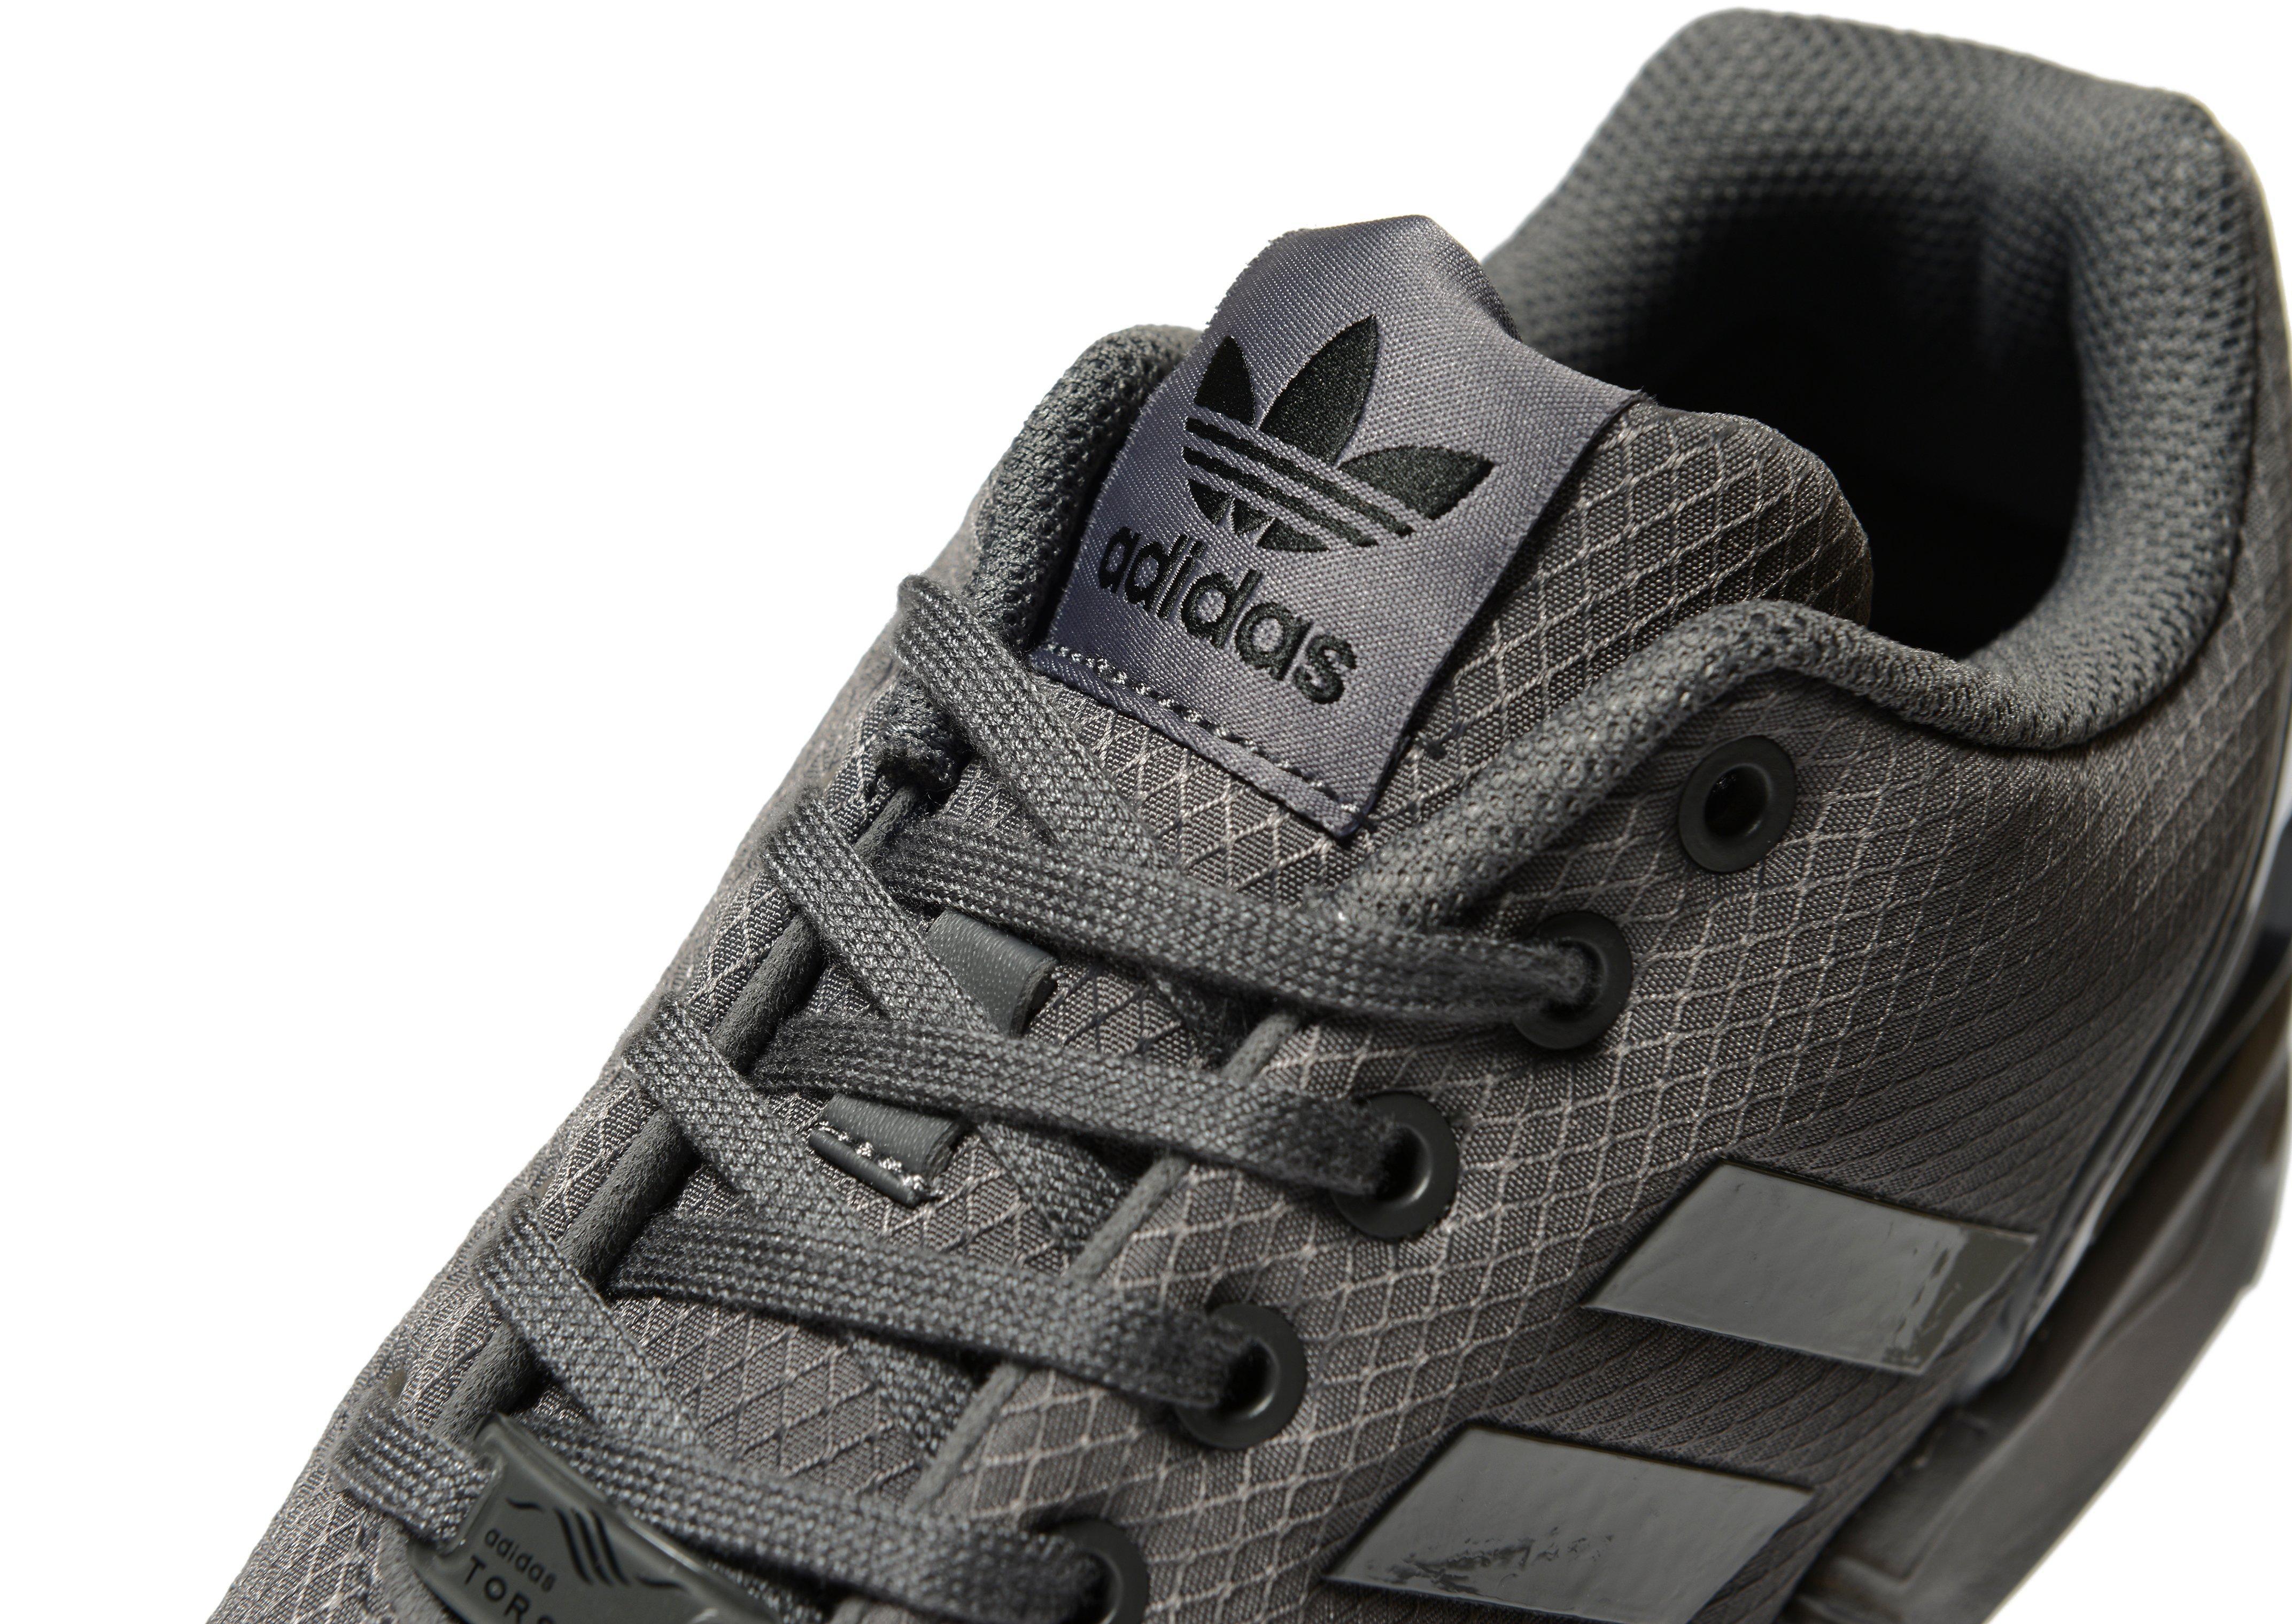 newest 83485 5879d Lyst - Adidas Originals Zx Flux Ripstop in Gray for Men